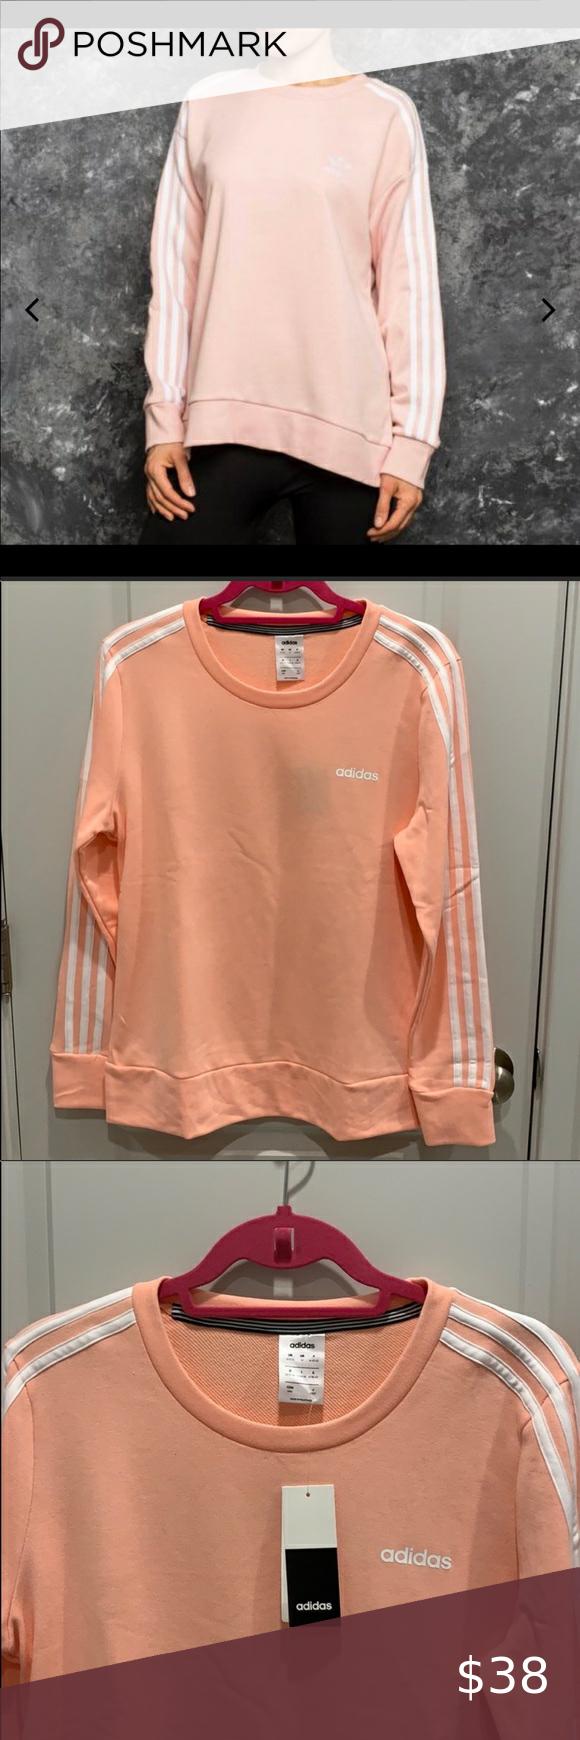 Adidas Crewneck Sweatshirt Sweatshirts Clothes Design Crew Neck Sweatshirt [ 1740 x 580 Pixel ]